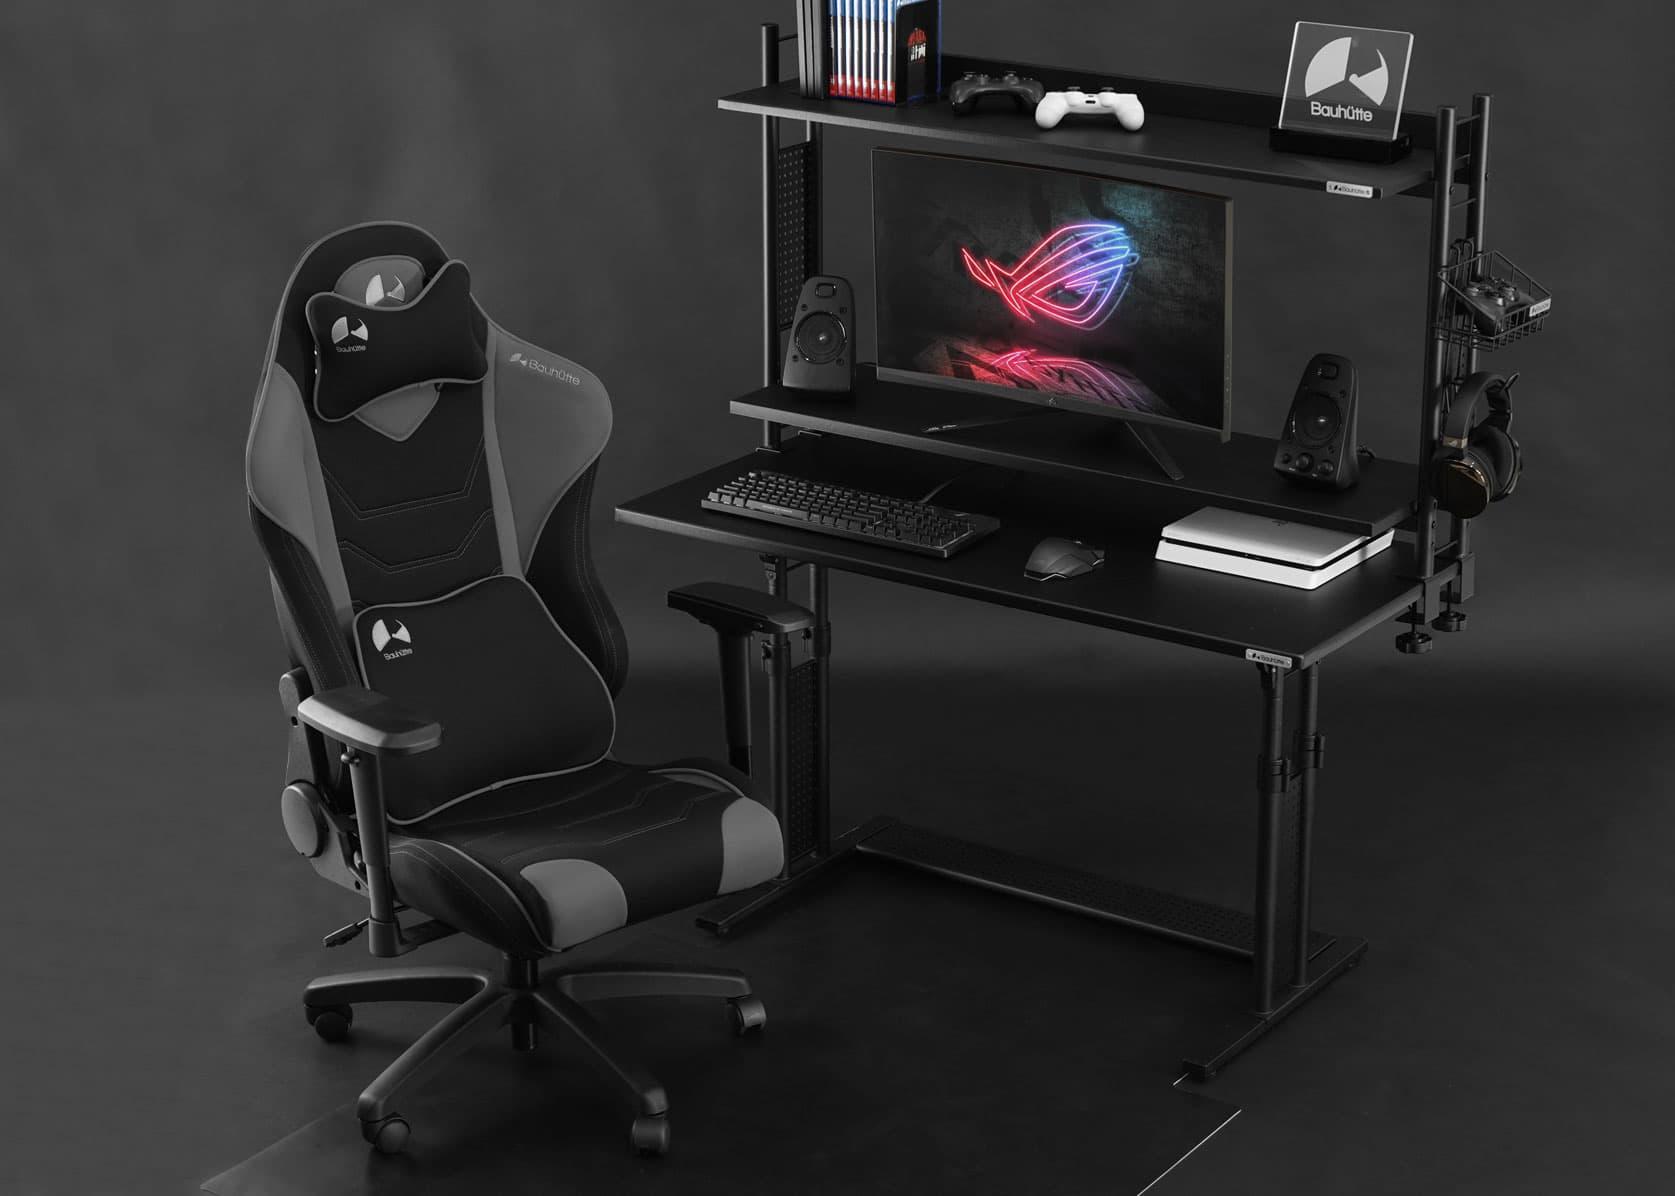 Desk Rack 2 BHS-1000HN / BHS-1200HN gallery